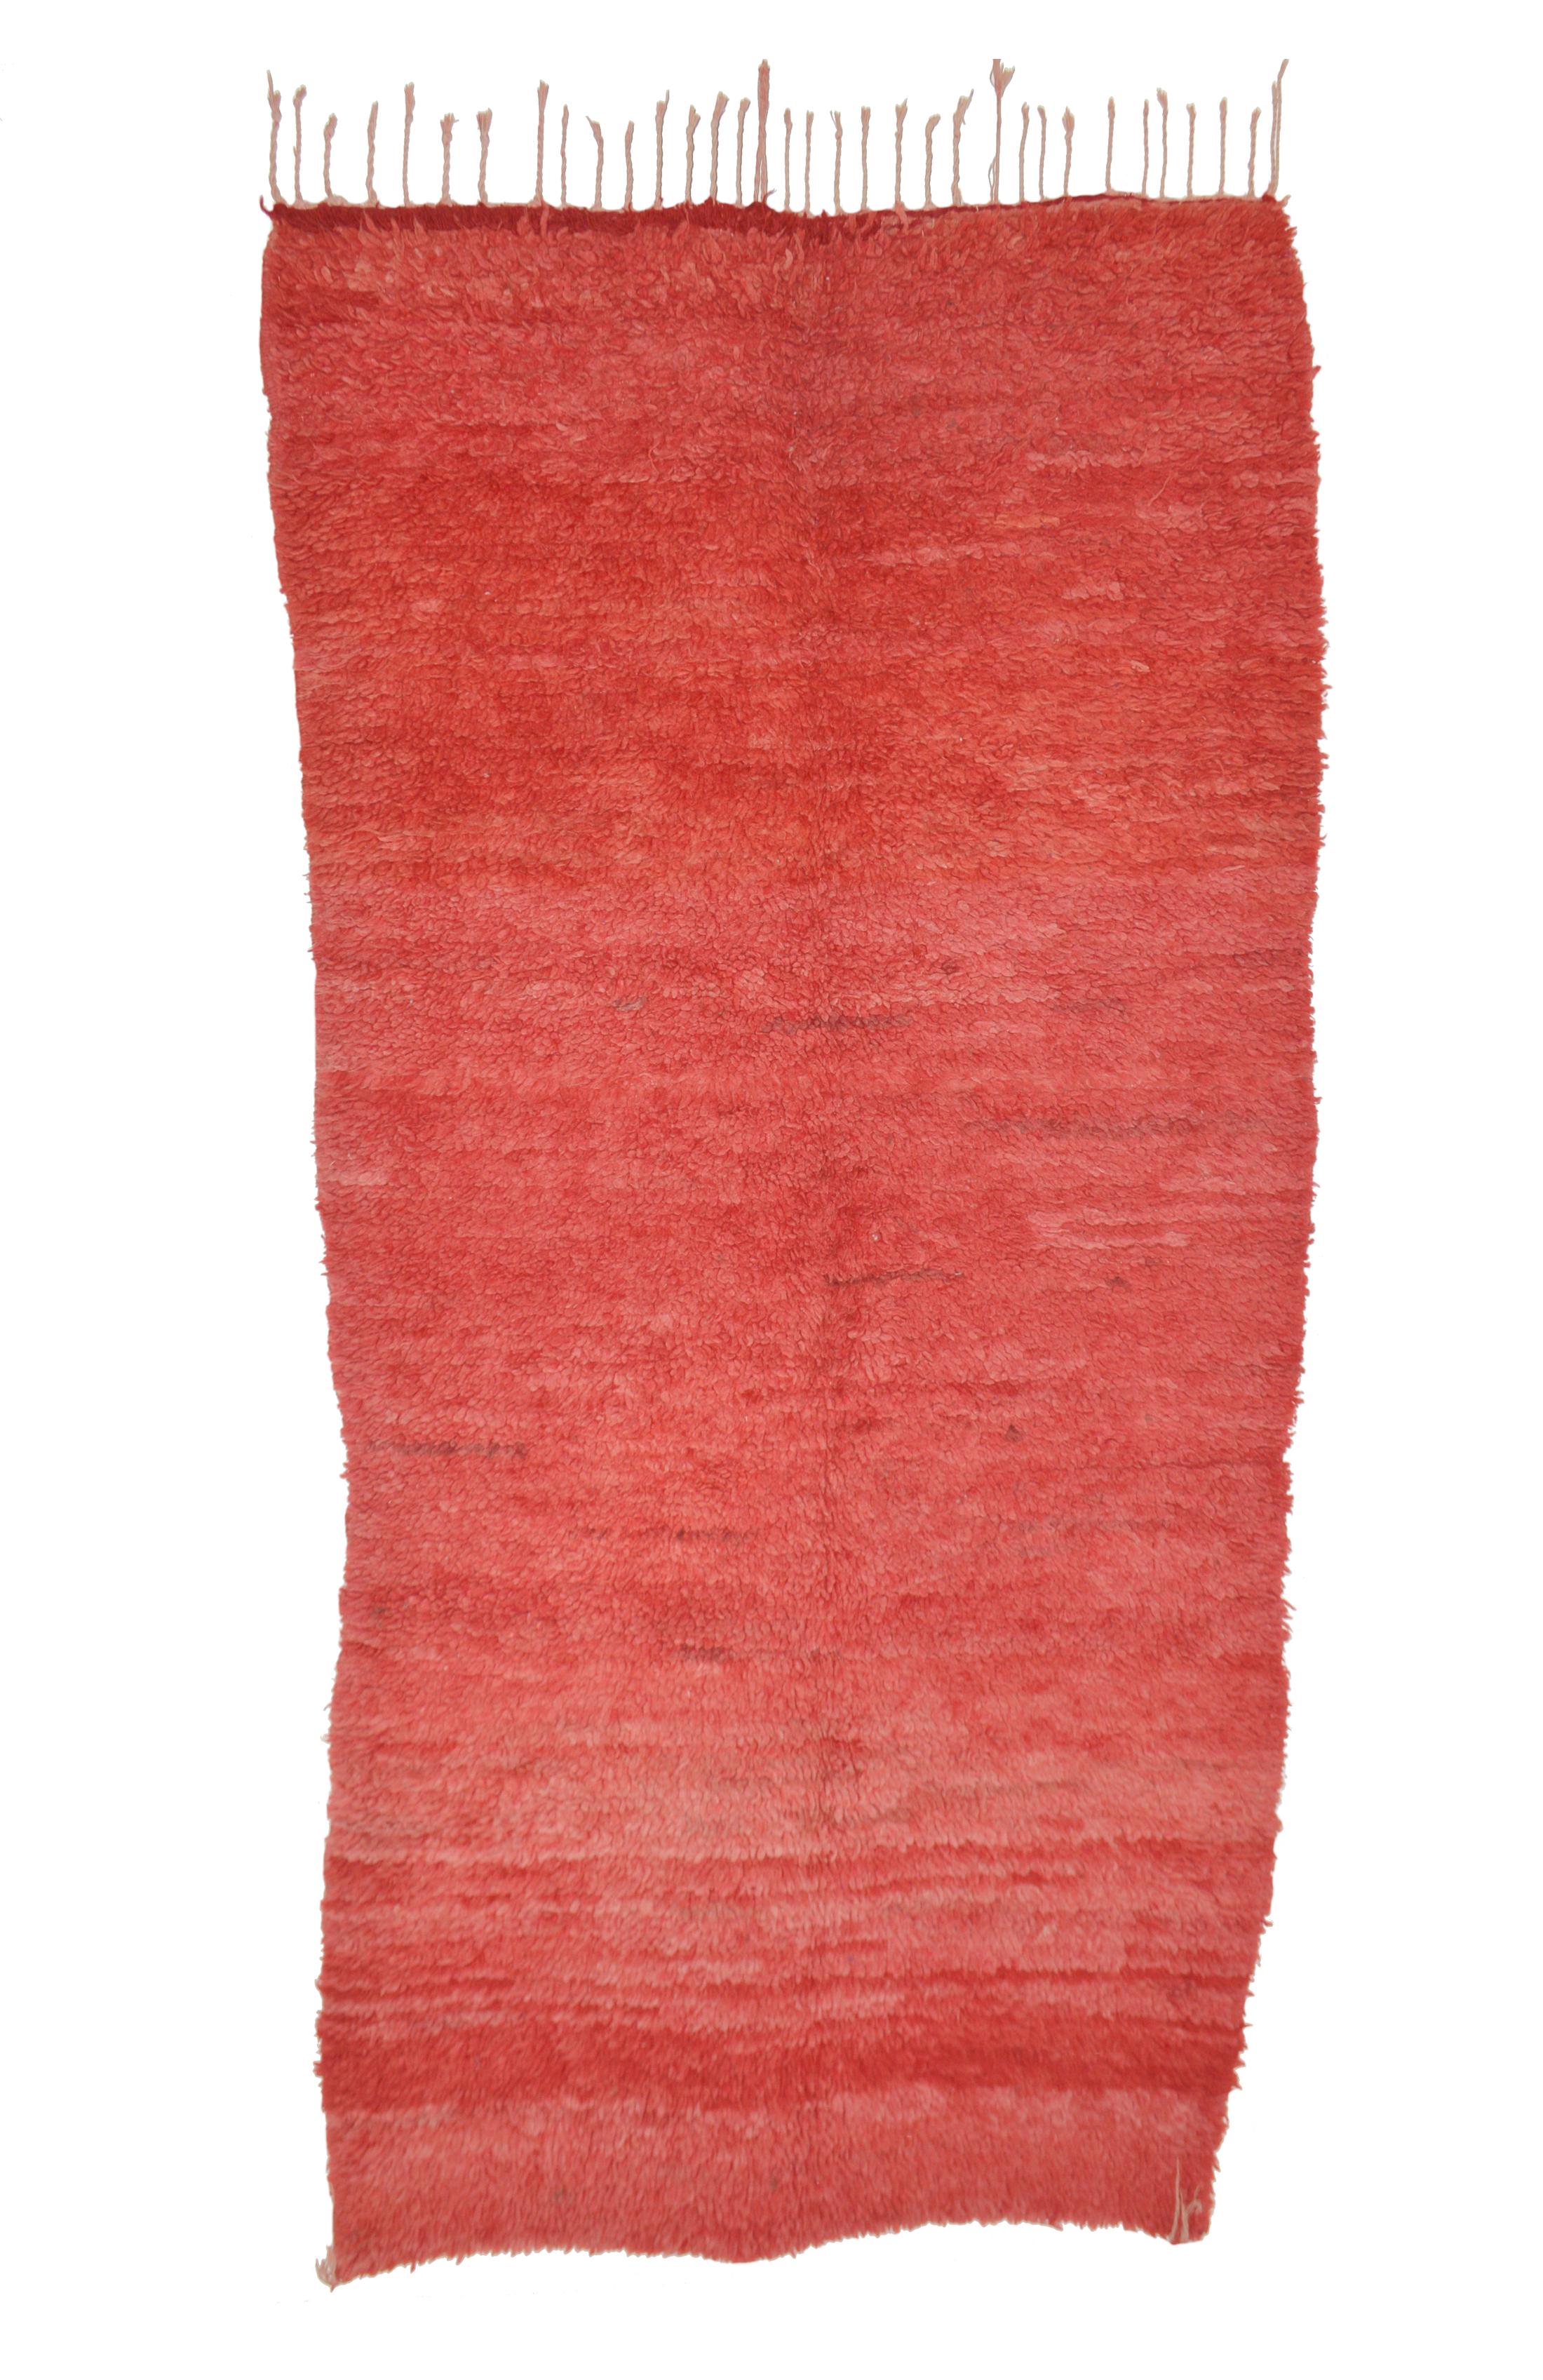 Beni Mguild TN 123 /  232 x 115 cm